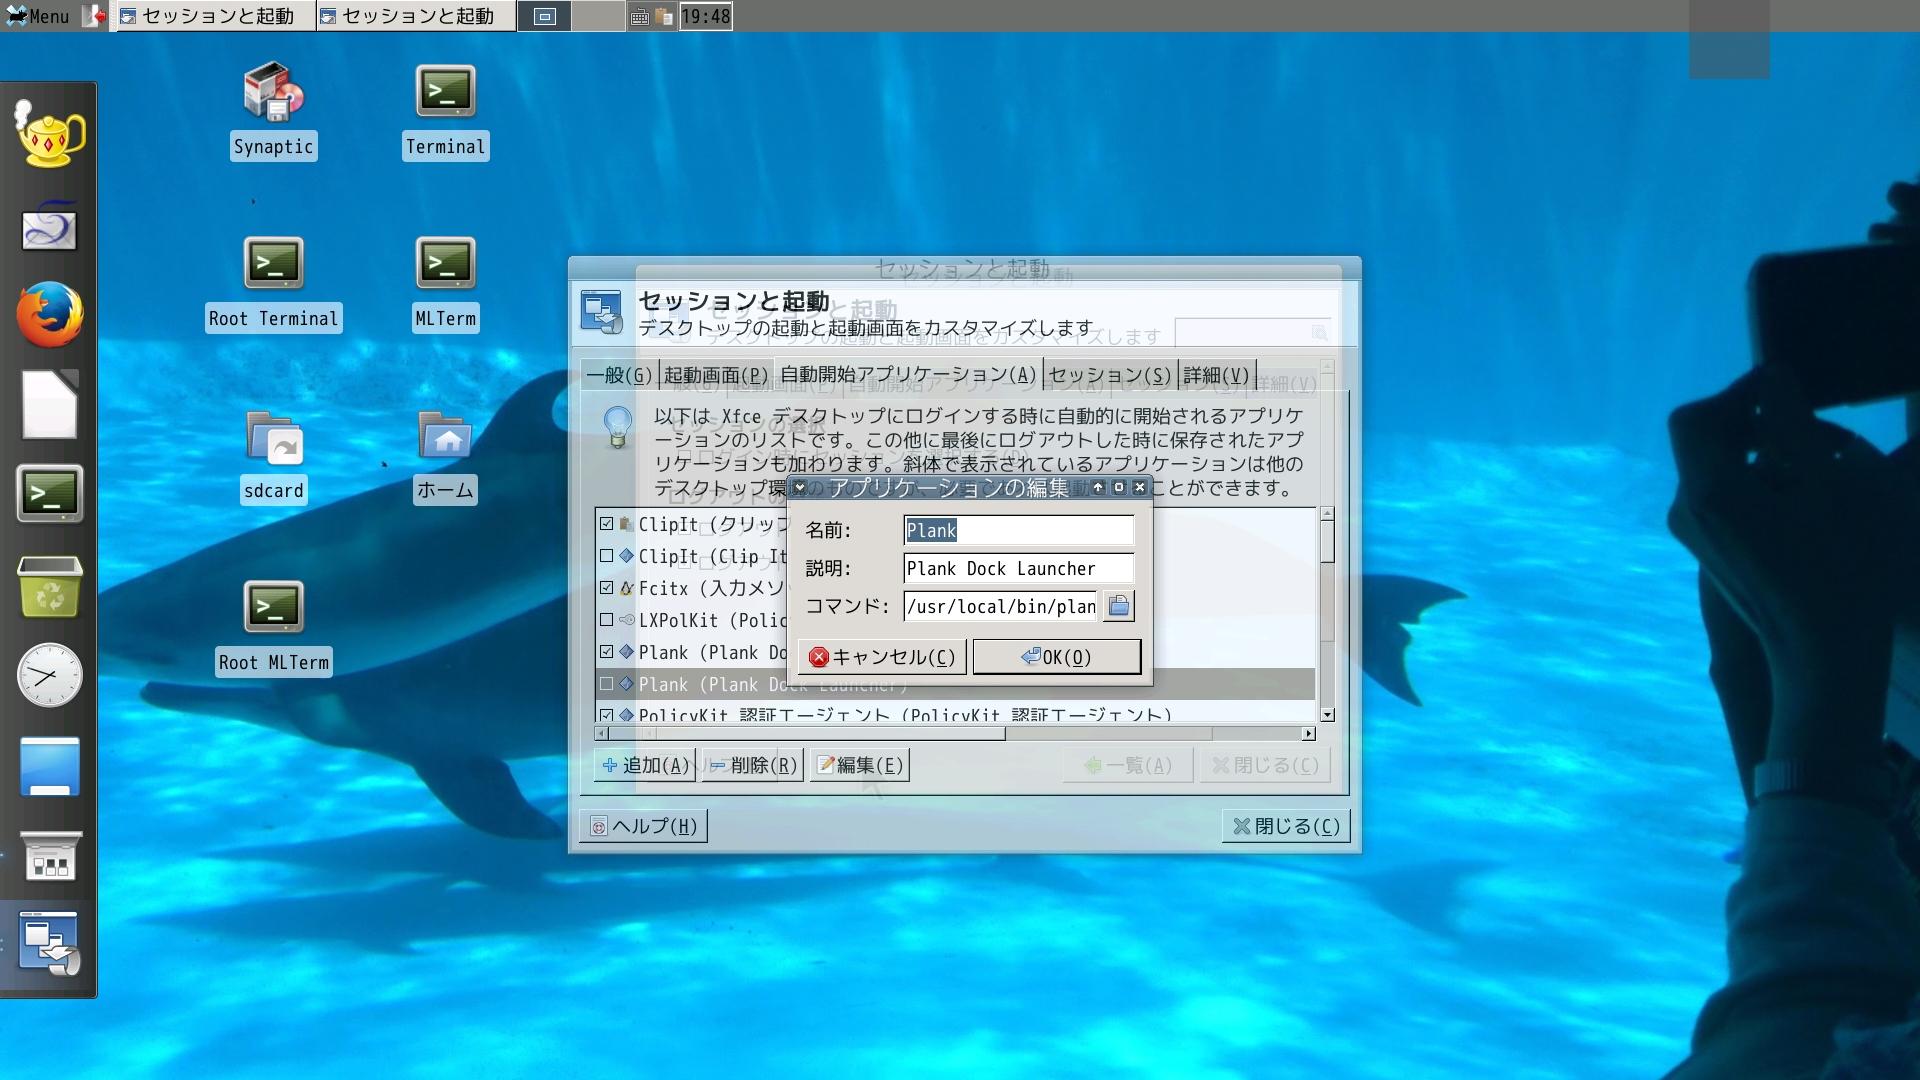 (Edit app of fxce4)